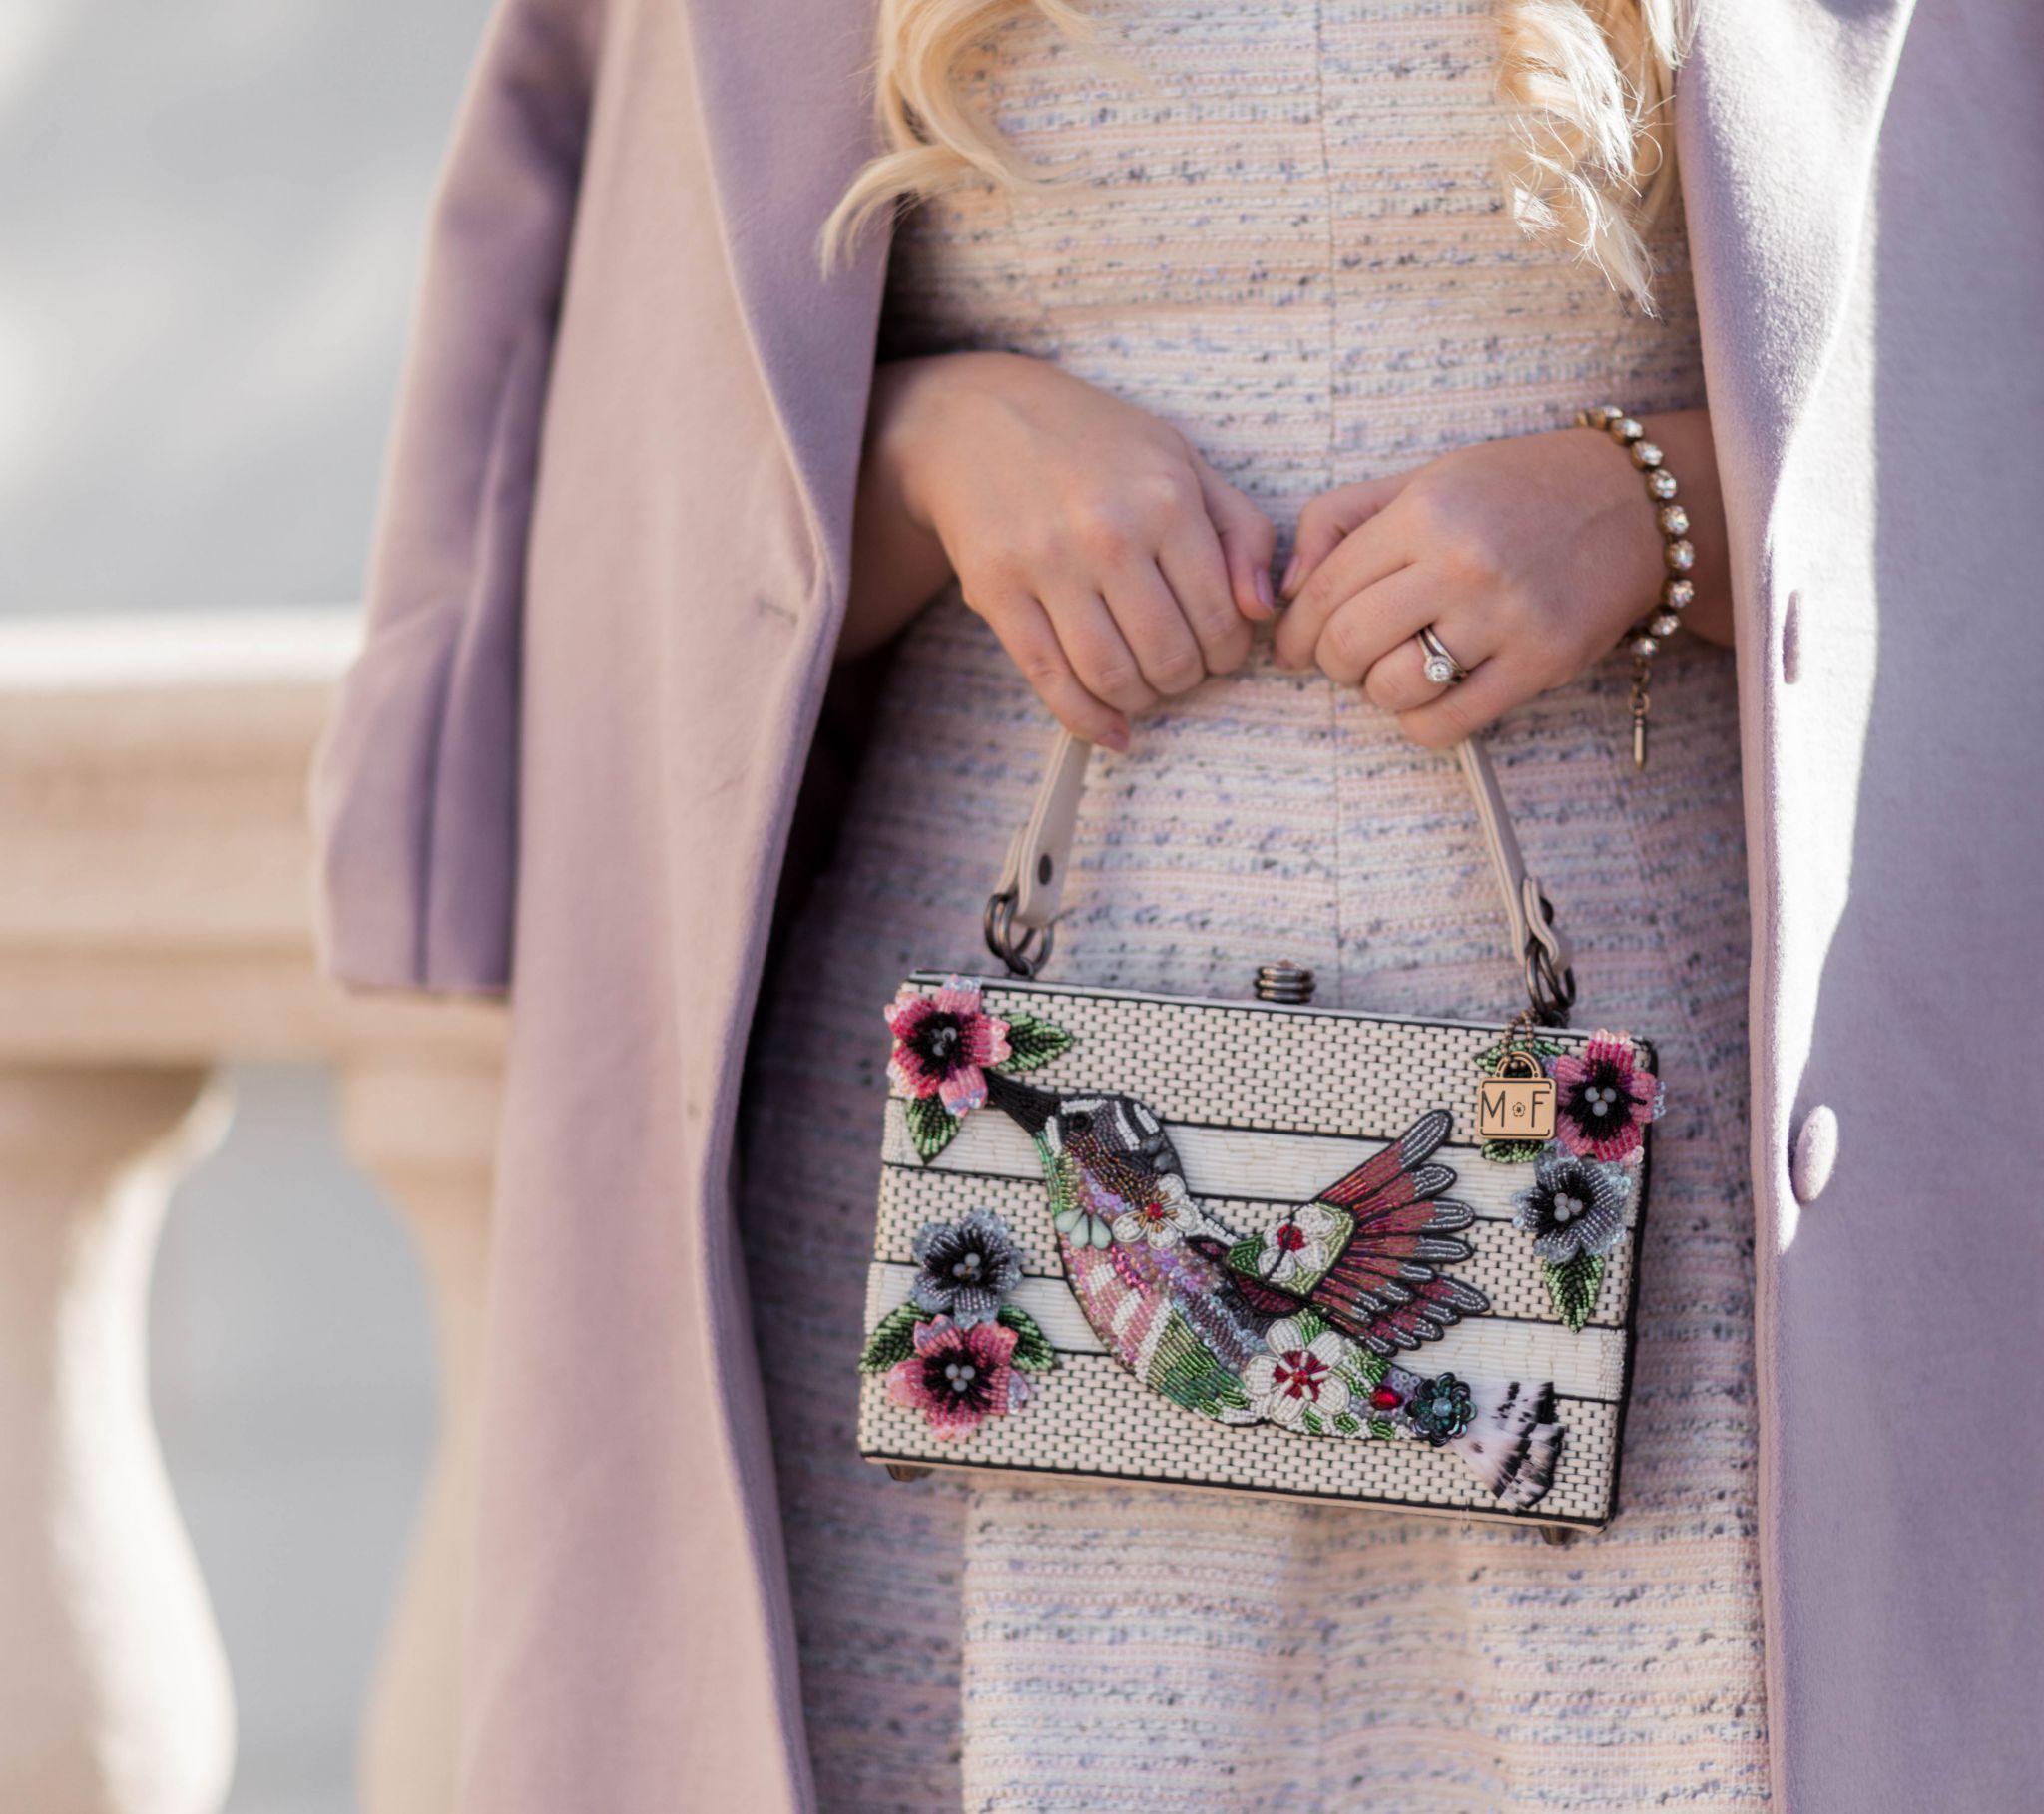 Fashion Blogger Elizabeth Hugen of Lizzie in Lace shares her Mary Frances designer handbag collection including this gorgeous bird handbag